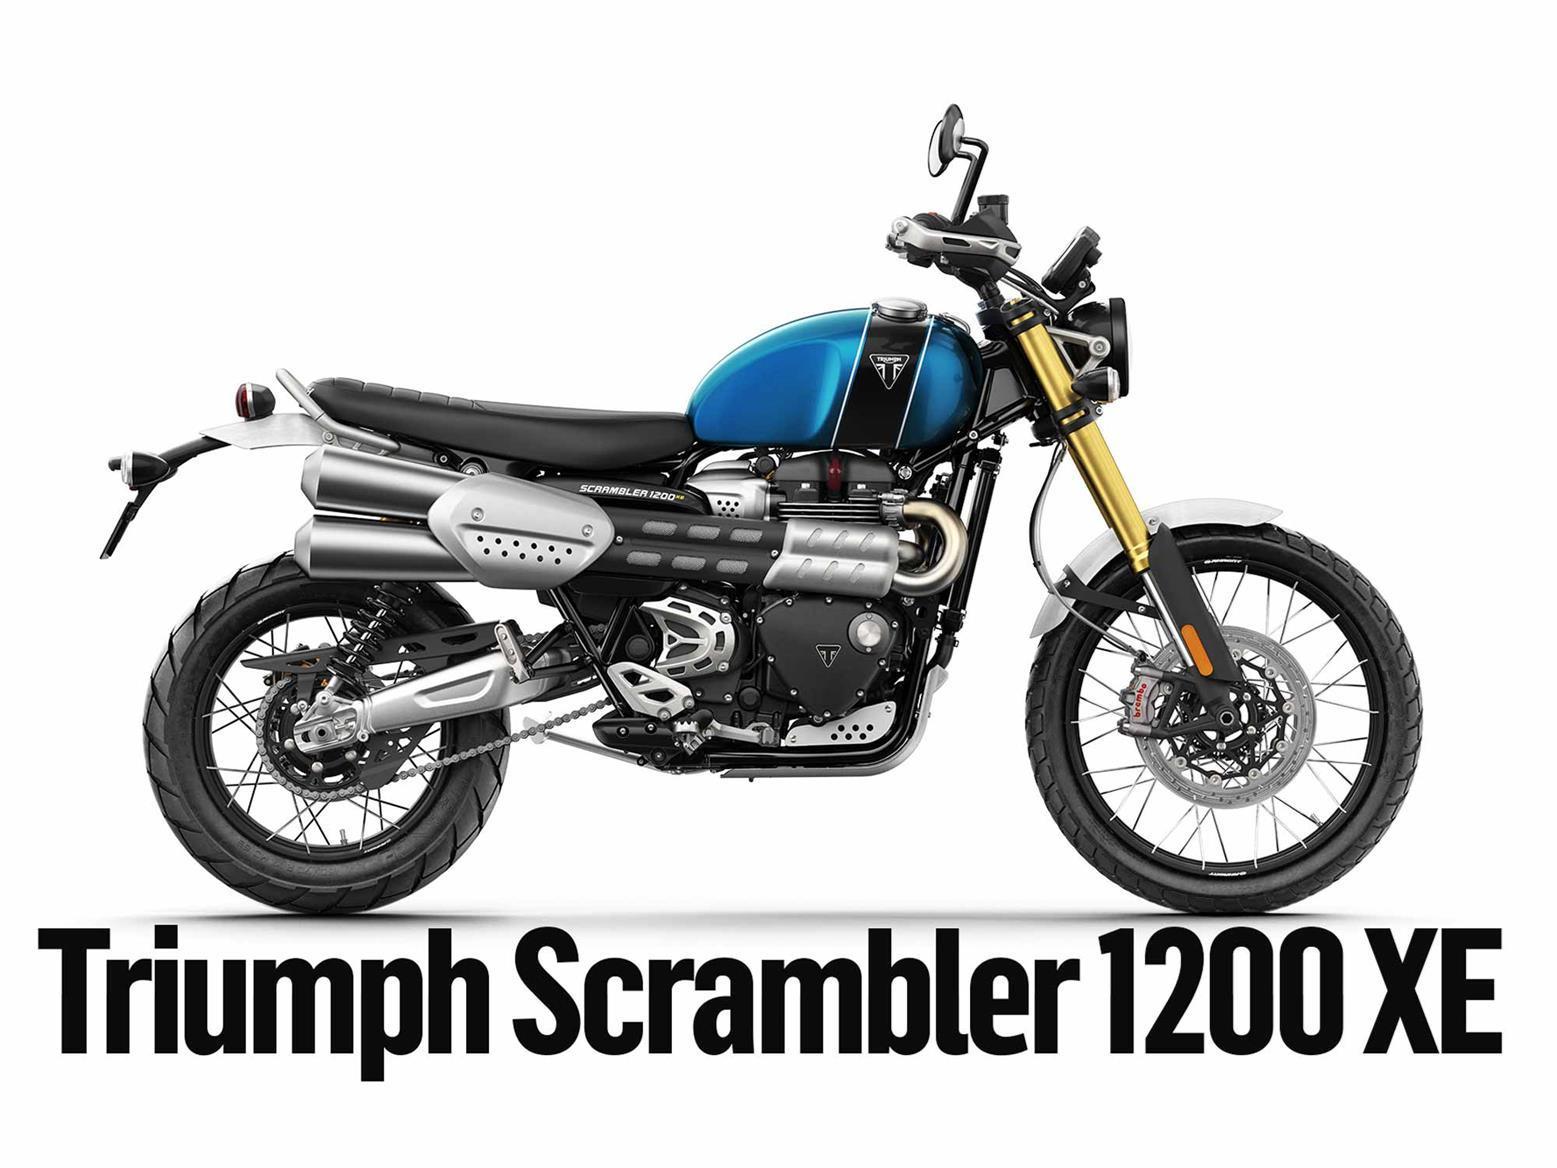 Read MCN's detailed Triumph Scrambler 1200 XE long-term test review here